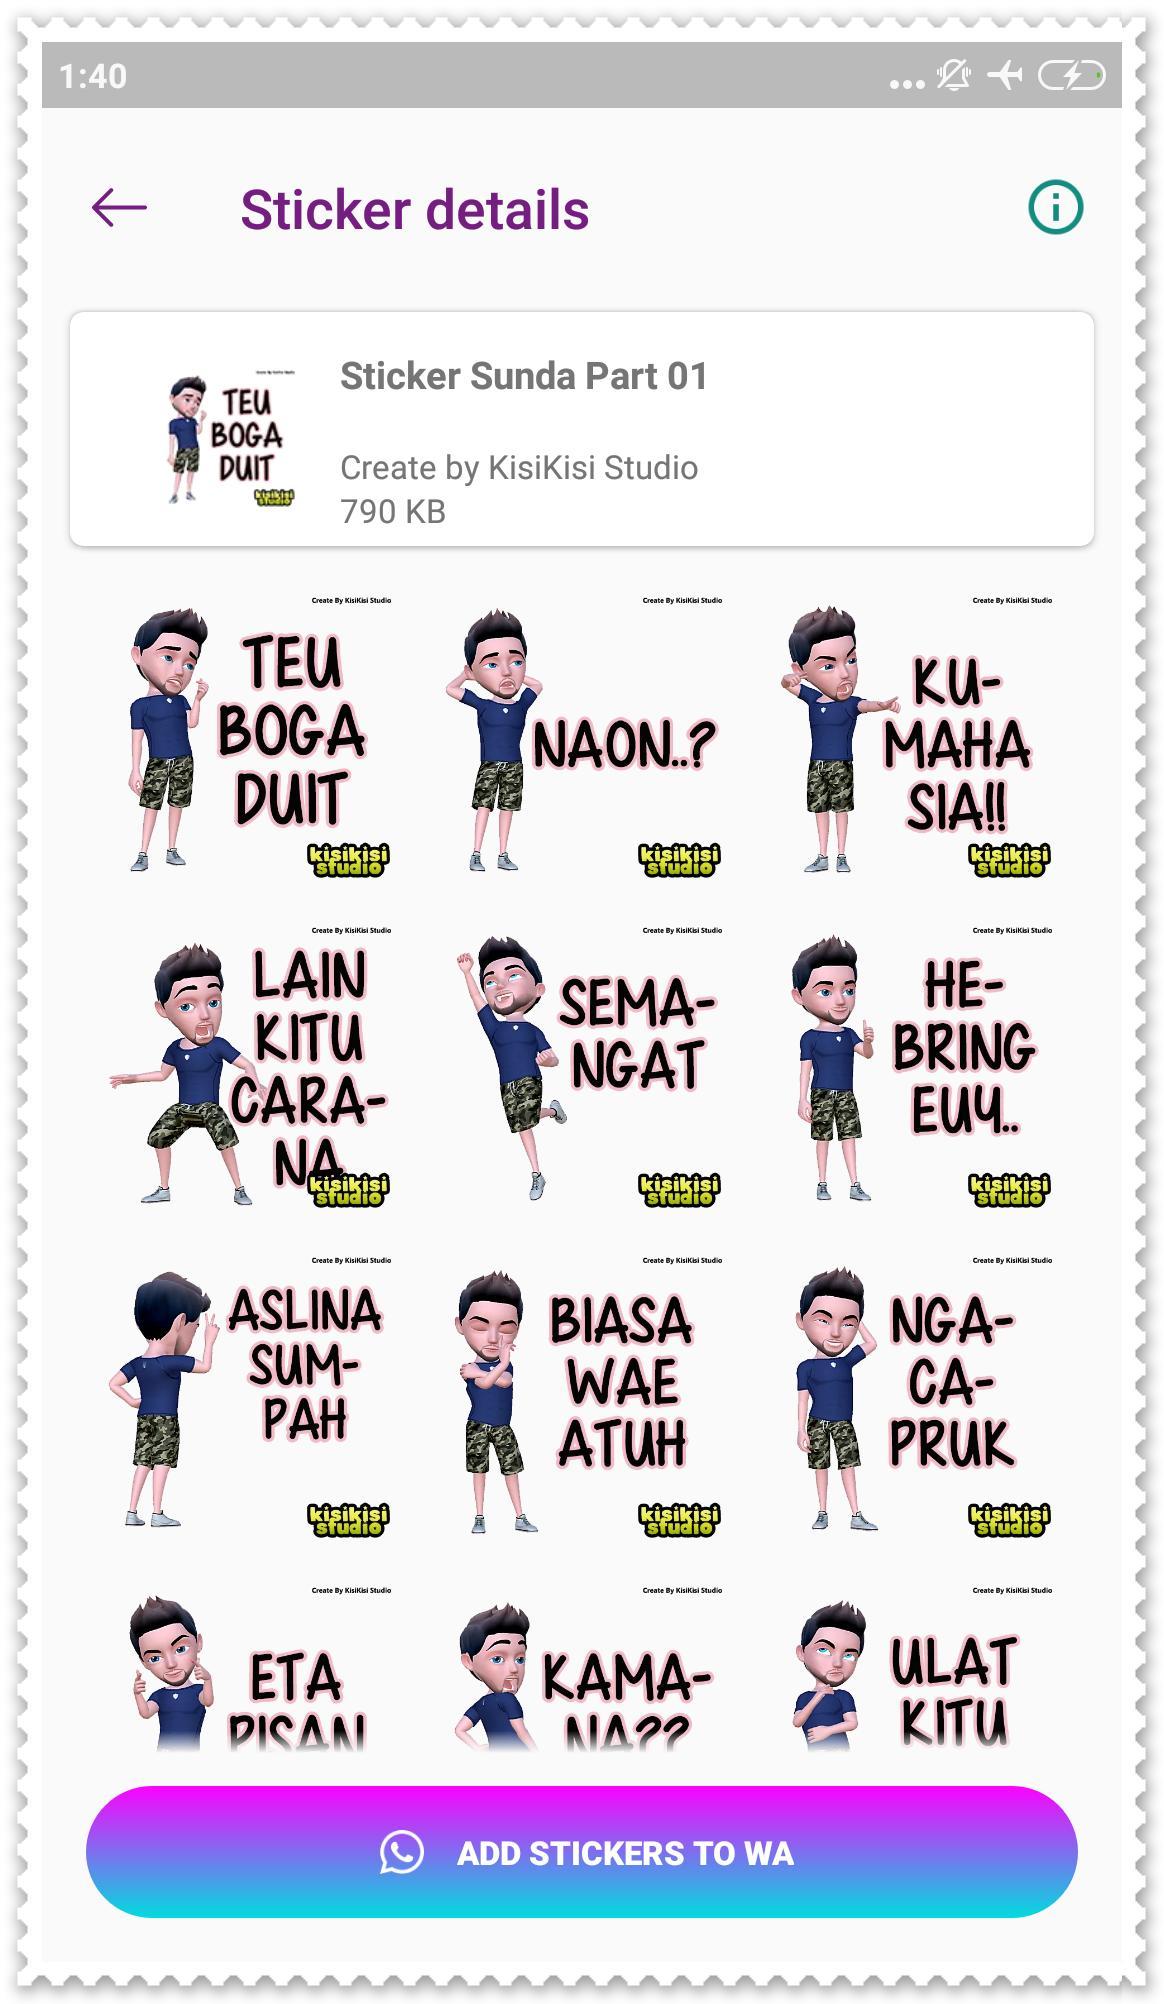 Stiker Sunda Lucu Wa Stickers For Android Apk Download